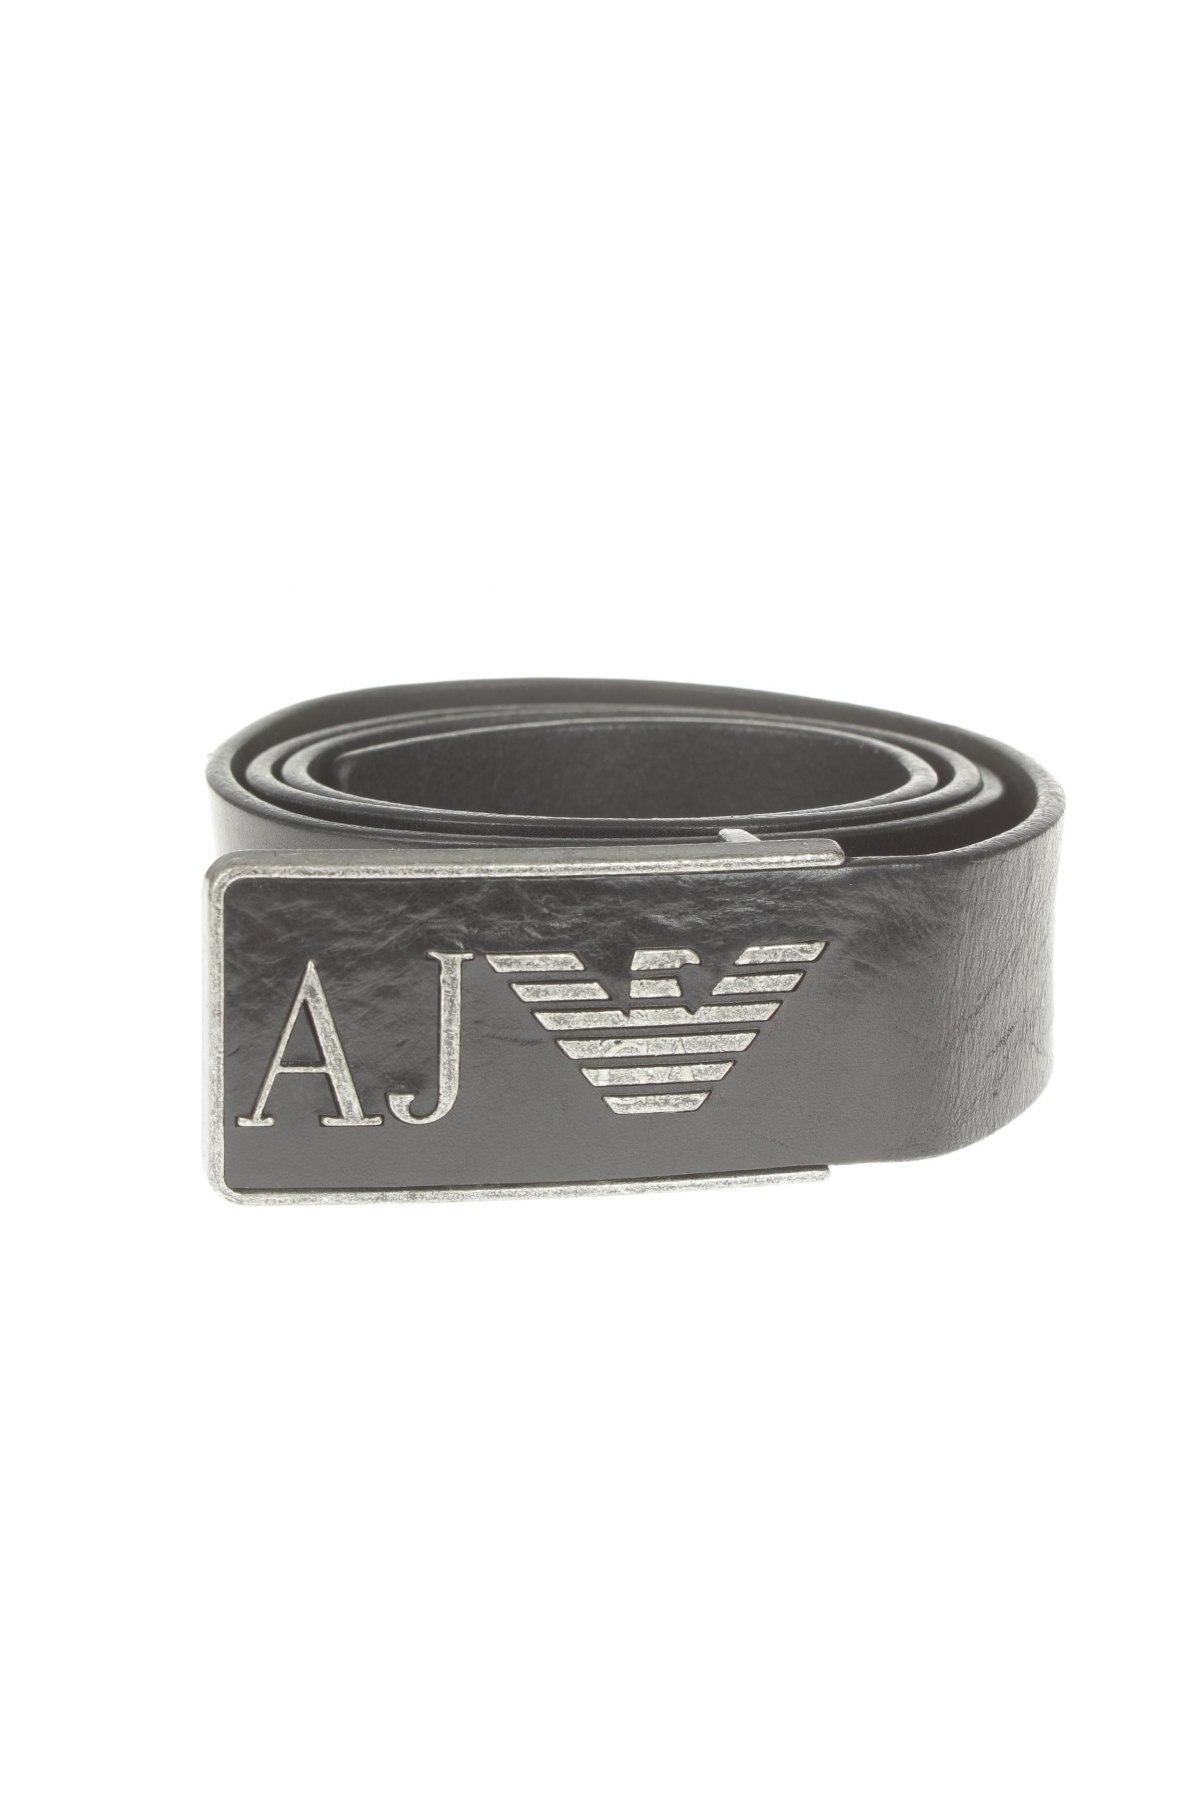 245e551c16 Ζώνη Armani Jeans - σε συμφέρουσα τιμή στο Remix -  8212074